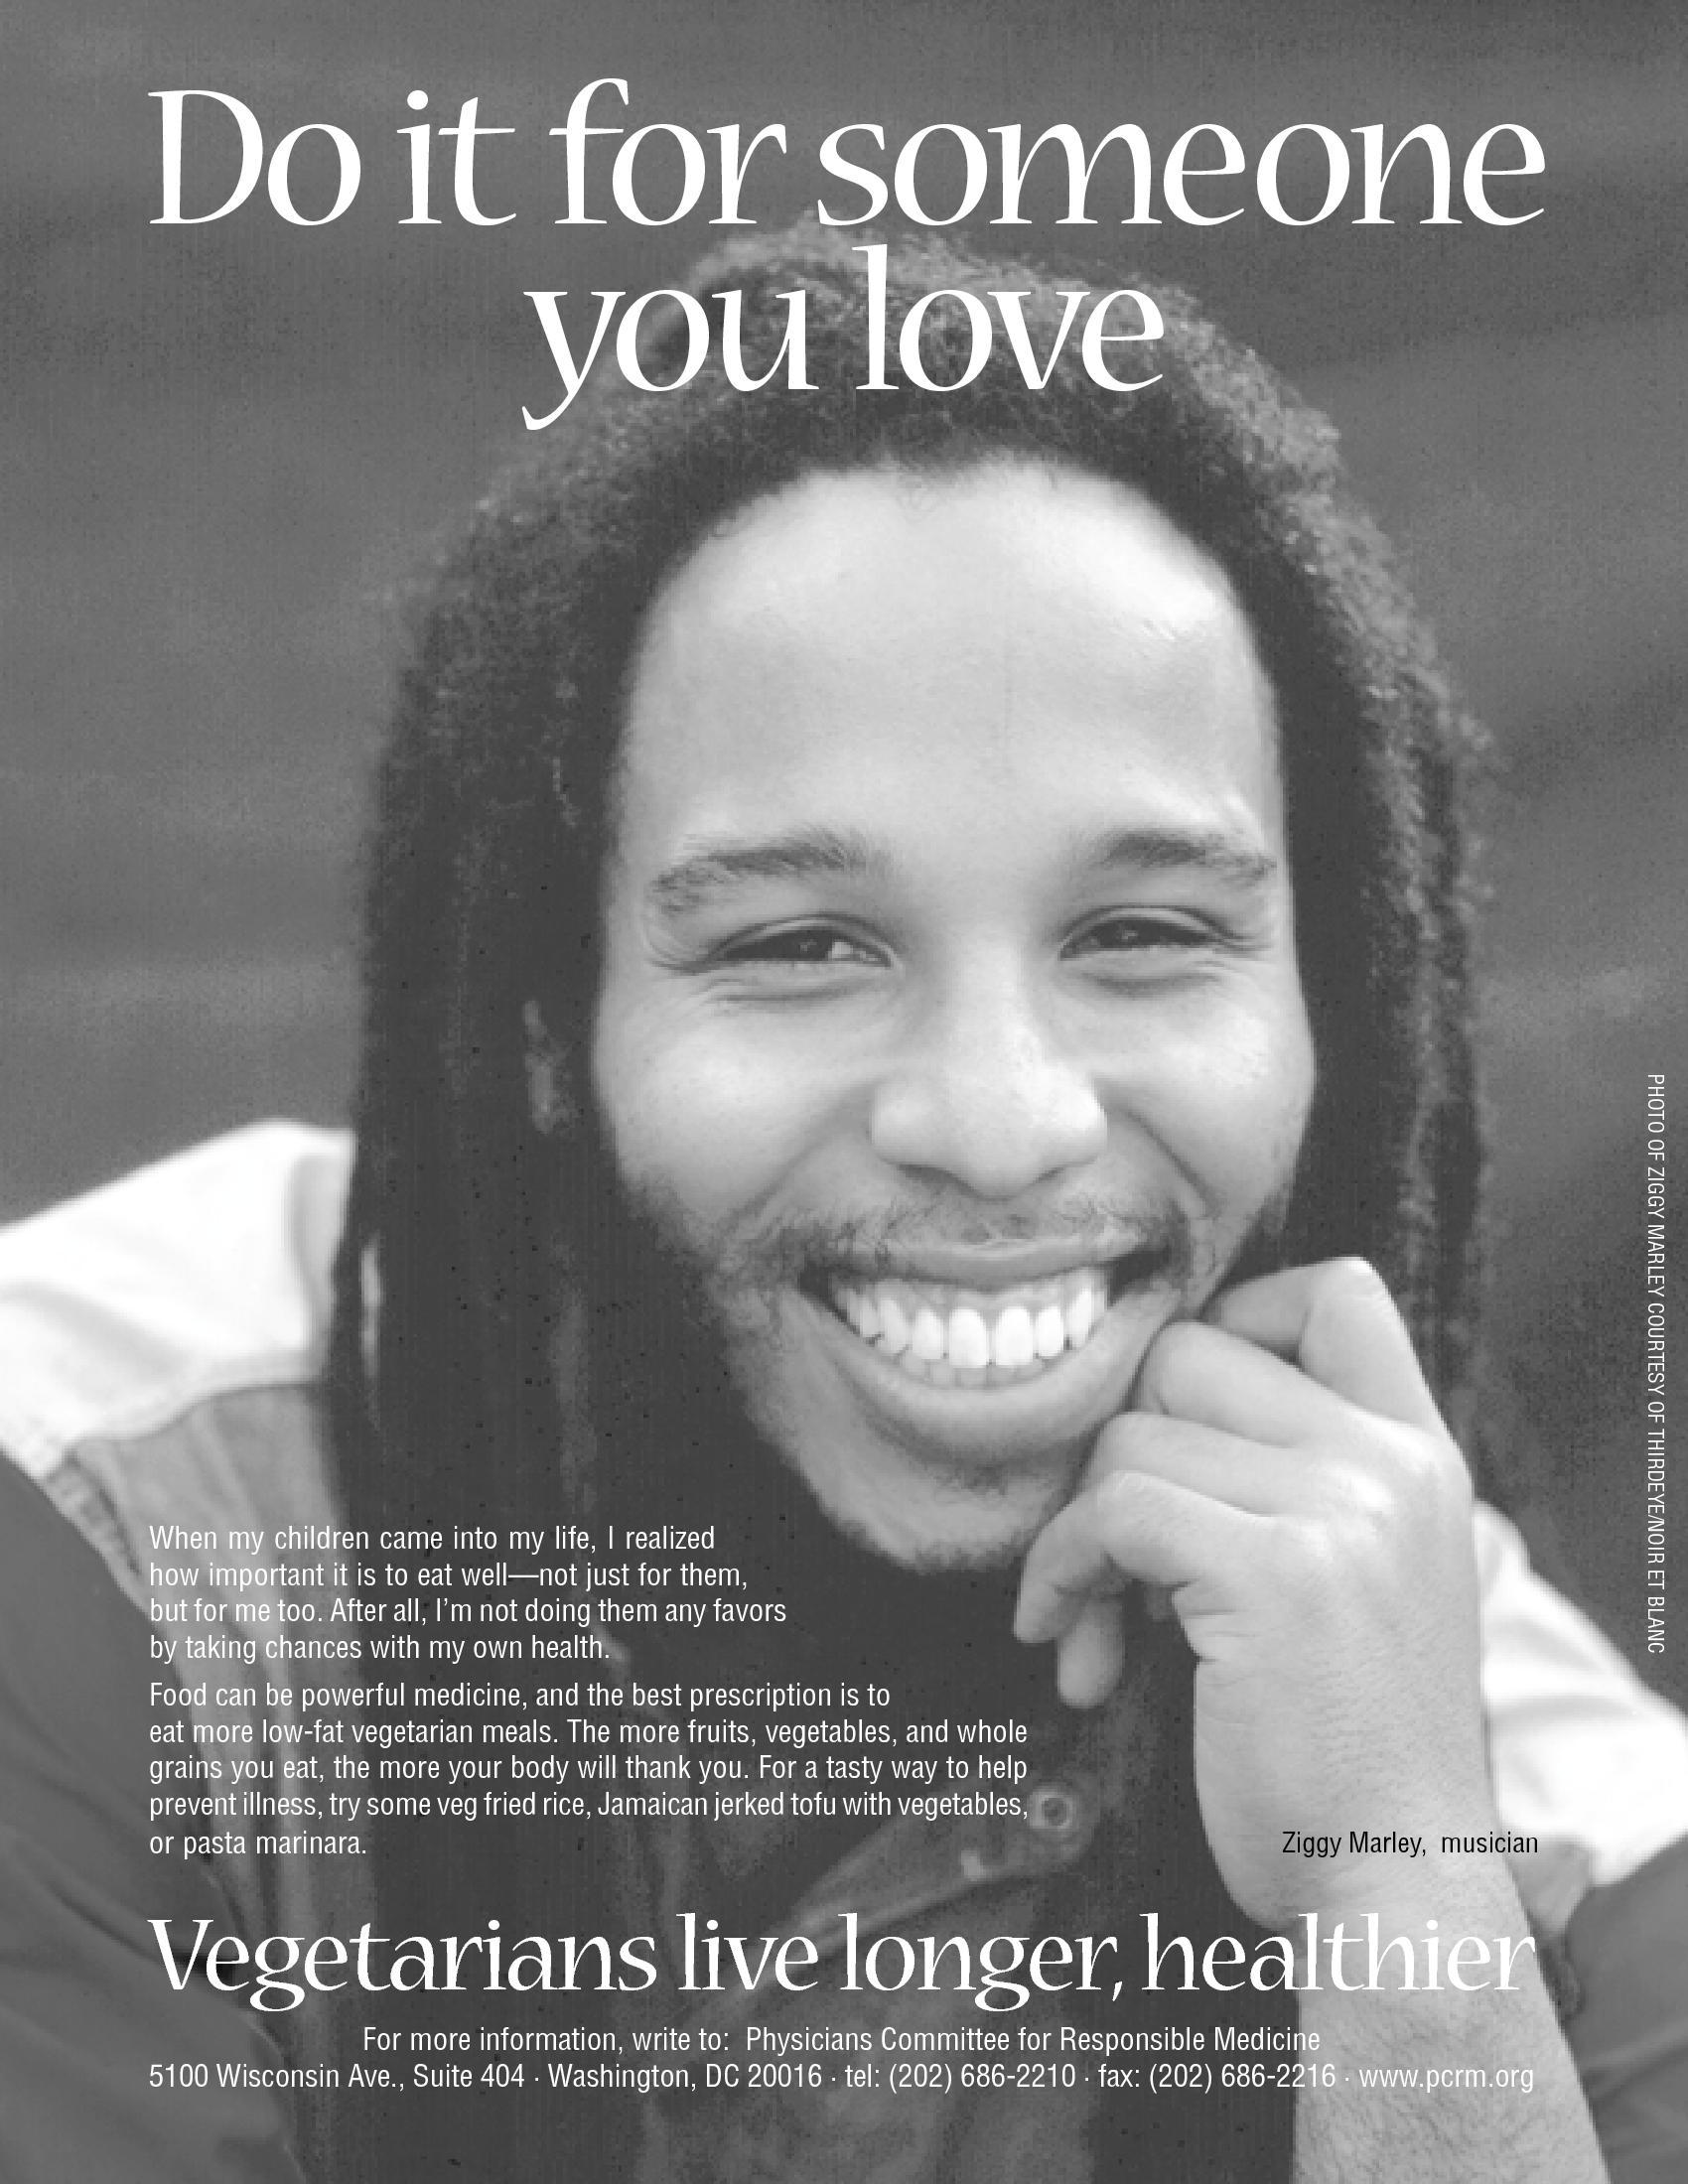 Ziggy Marley's quote #3